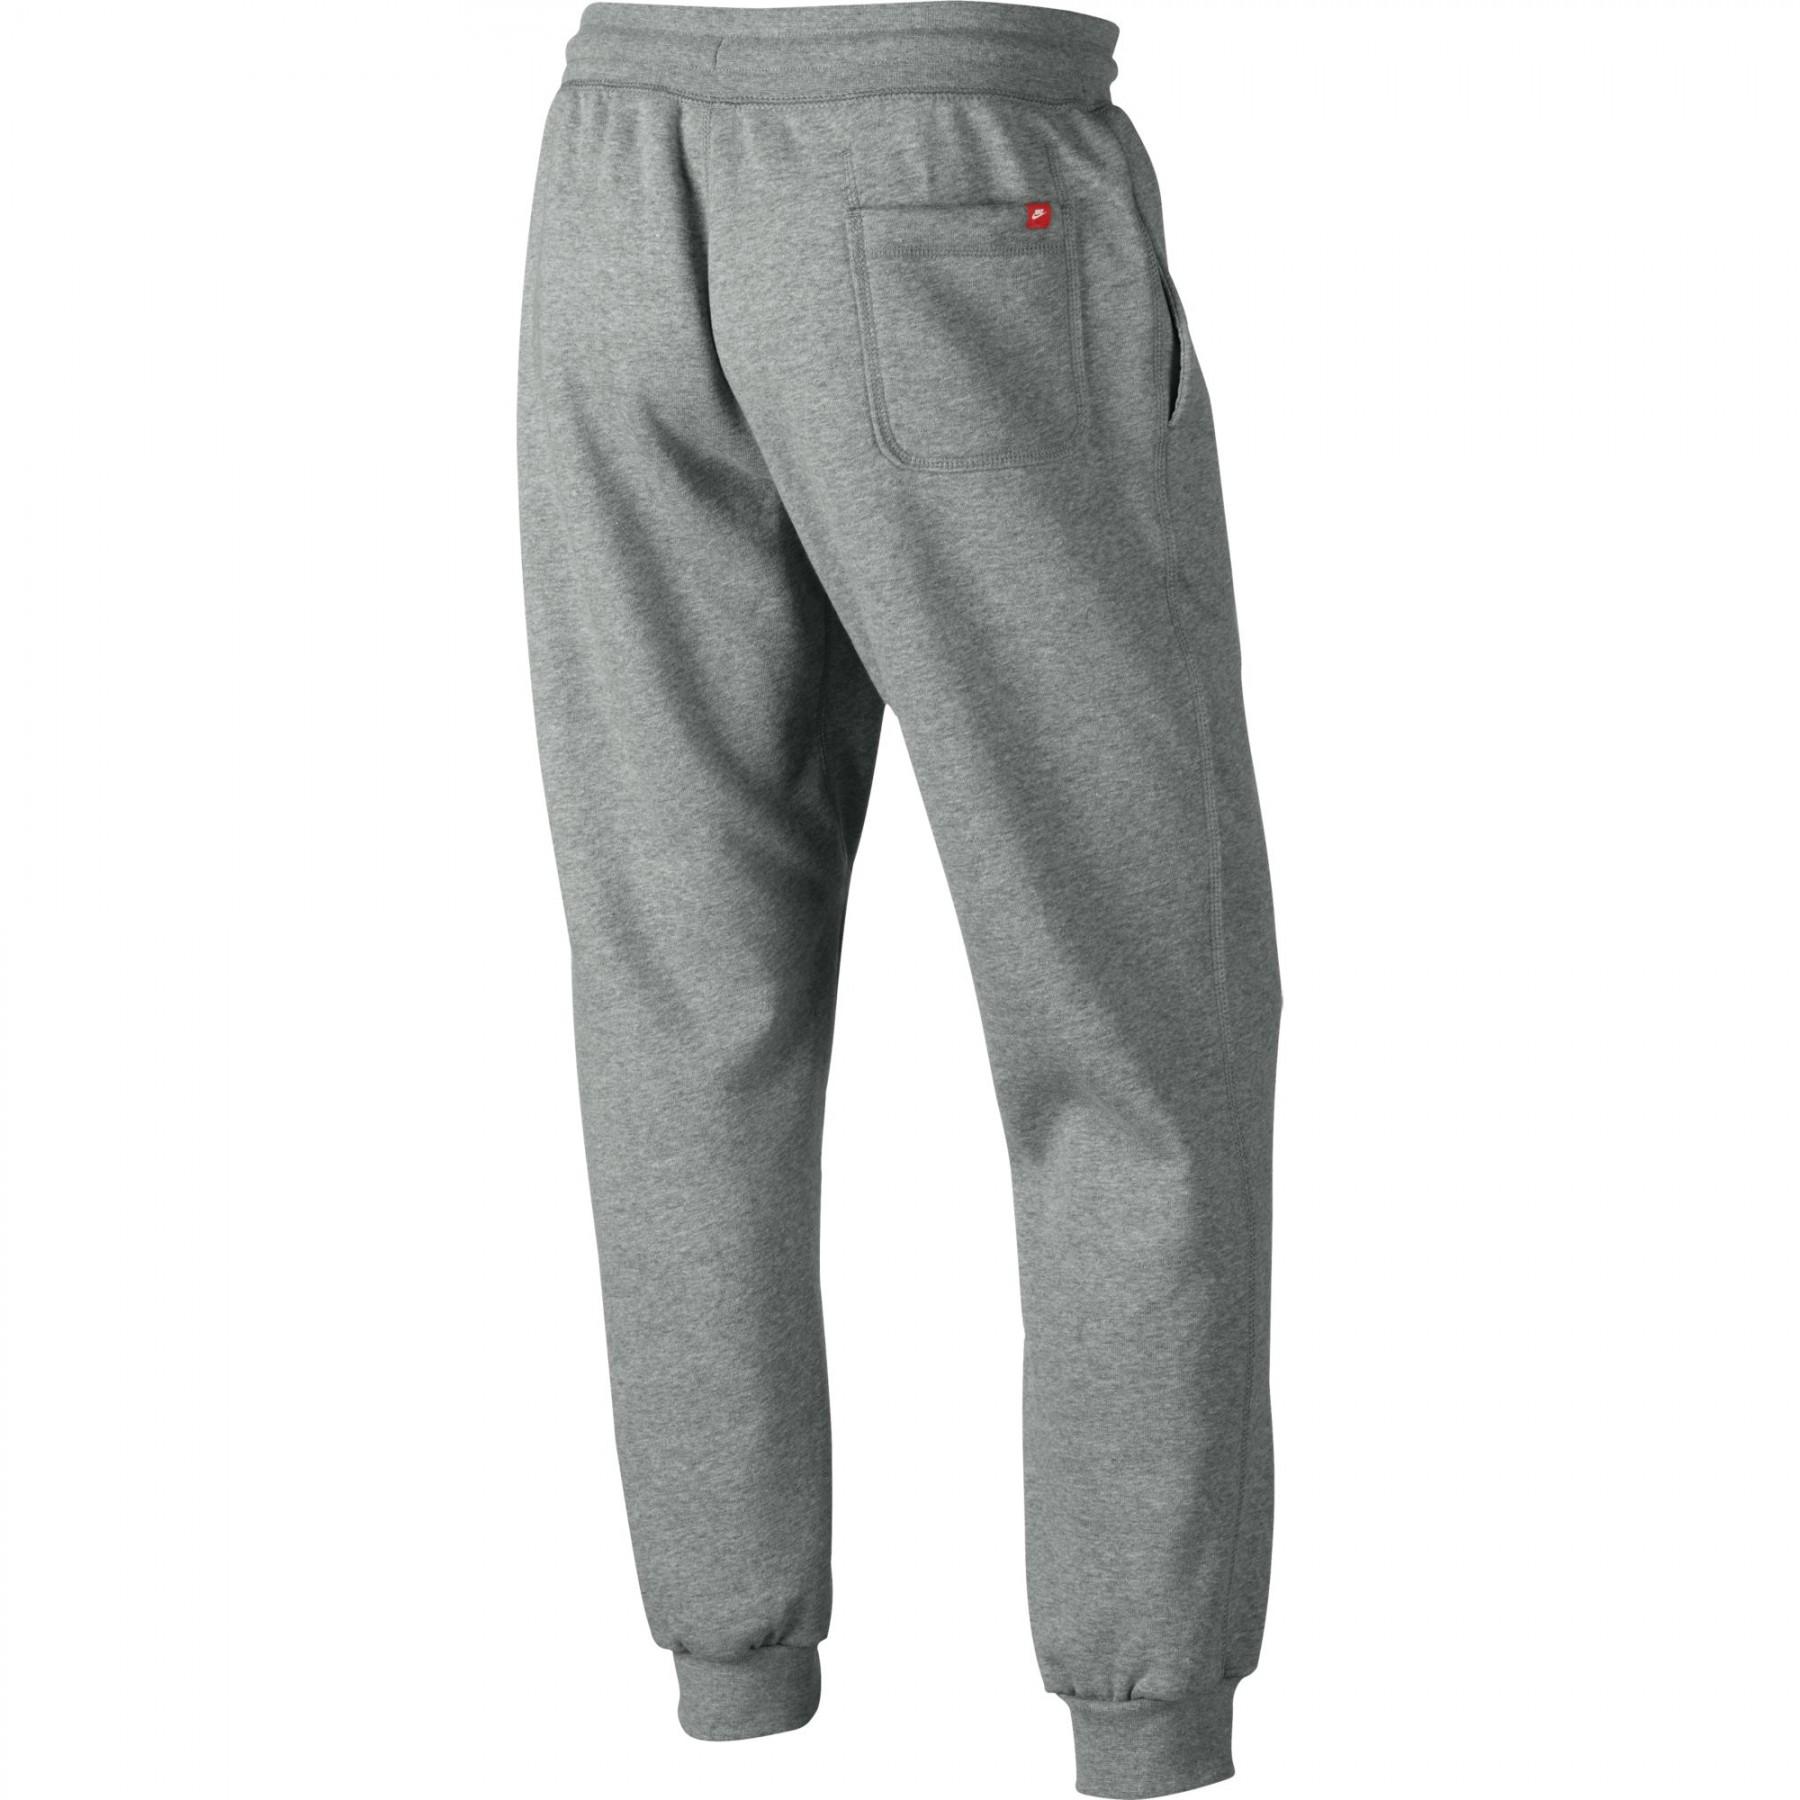 Doudoune Jogging Amp  Pull Chapka Vetement Pantalon Nike De D hiver  zx5ZvnqESw 7b9adfd428b